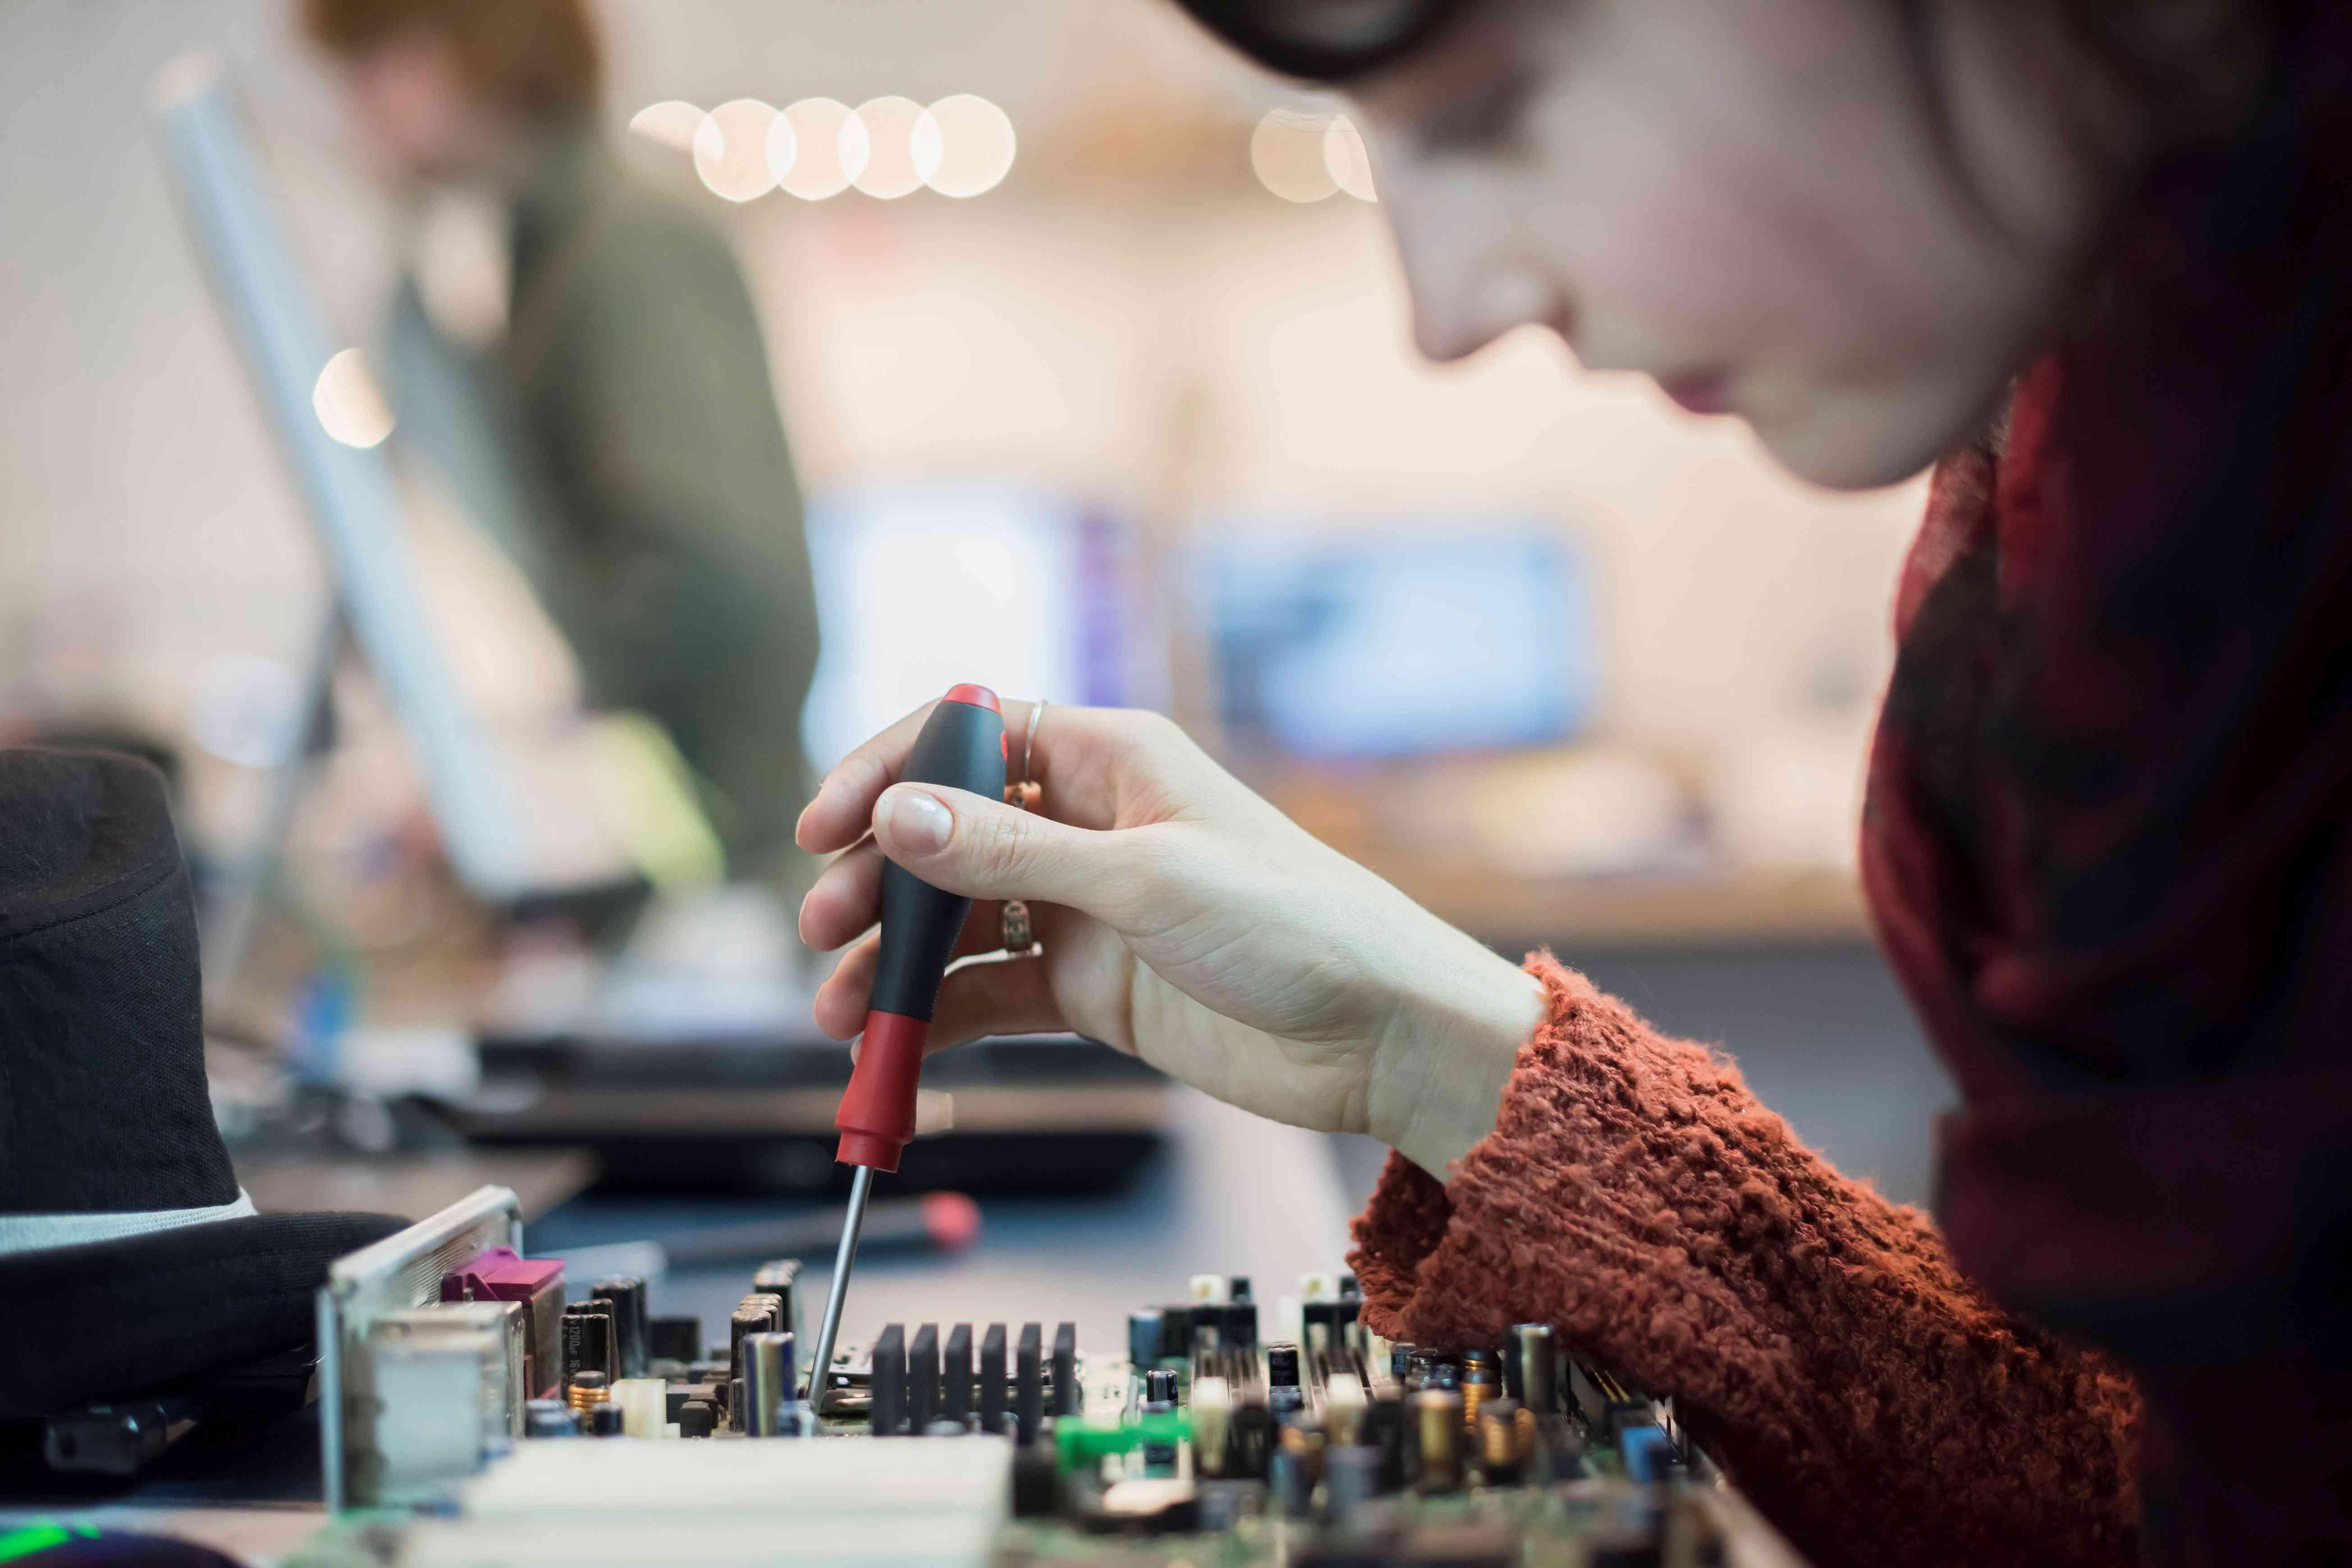 Repair technician working on a computer in a computer repair shop